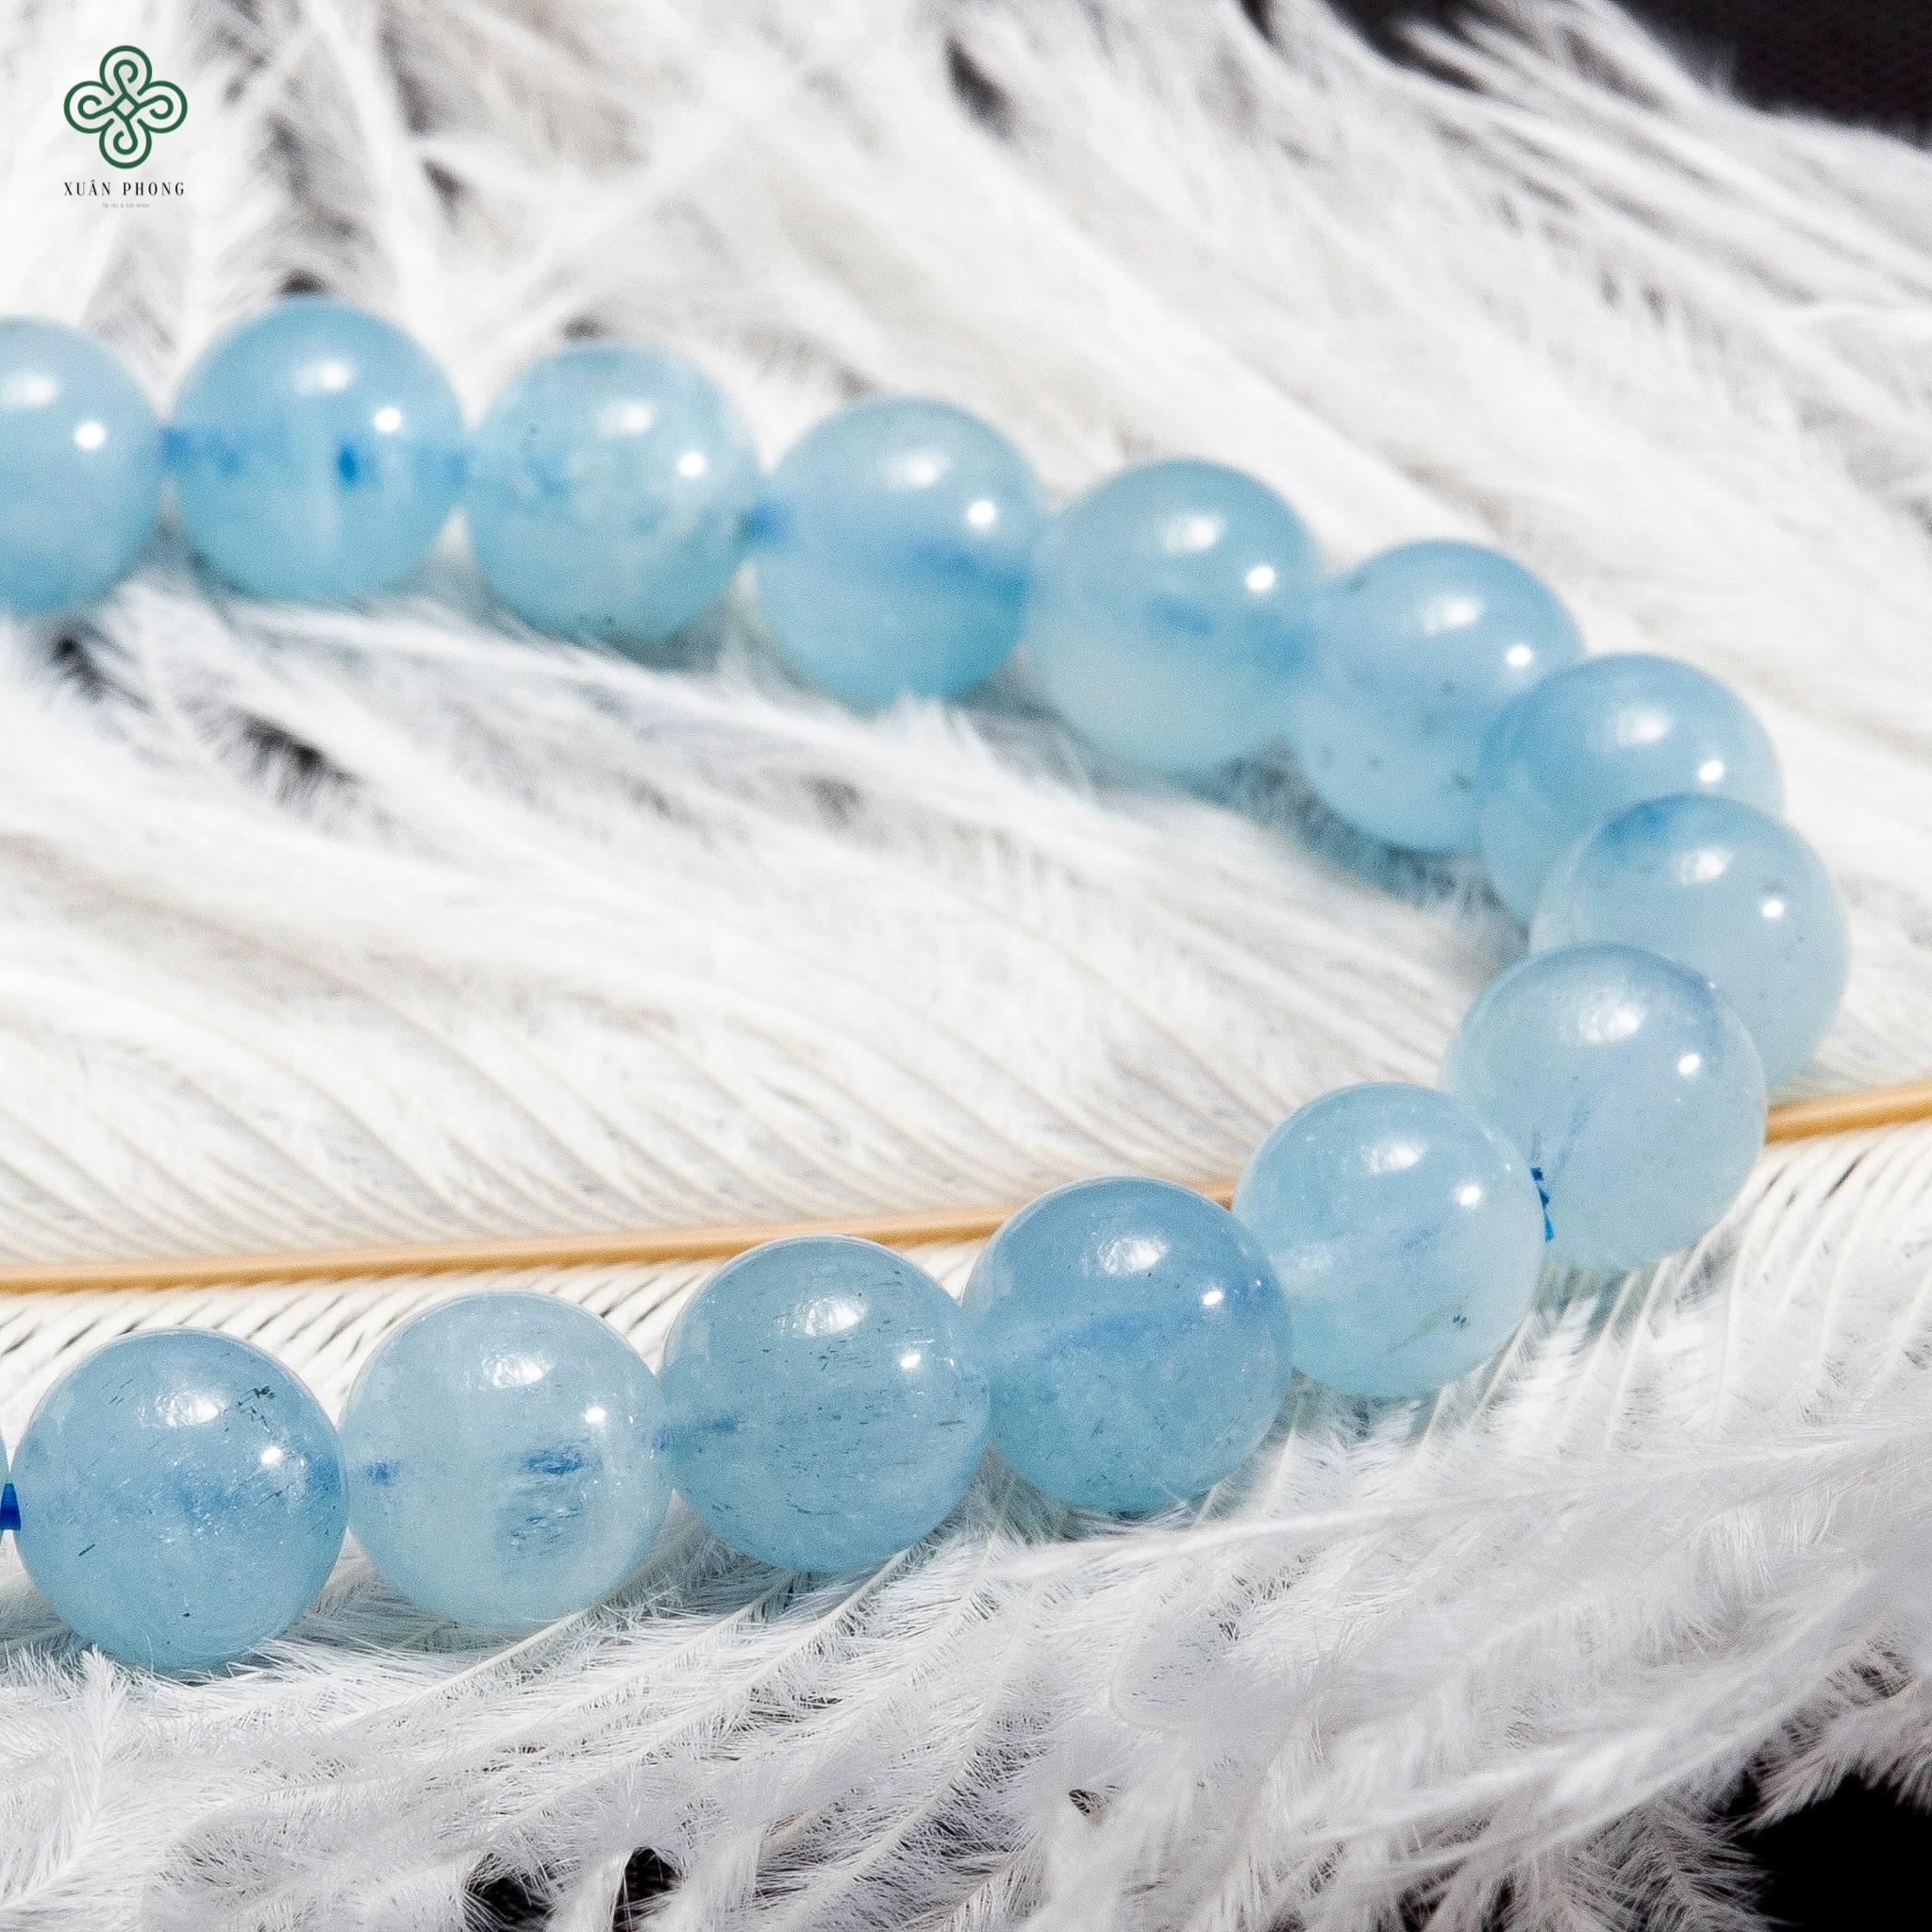 vong-tay-phong-thuy-da-aquamarine-03